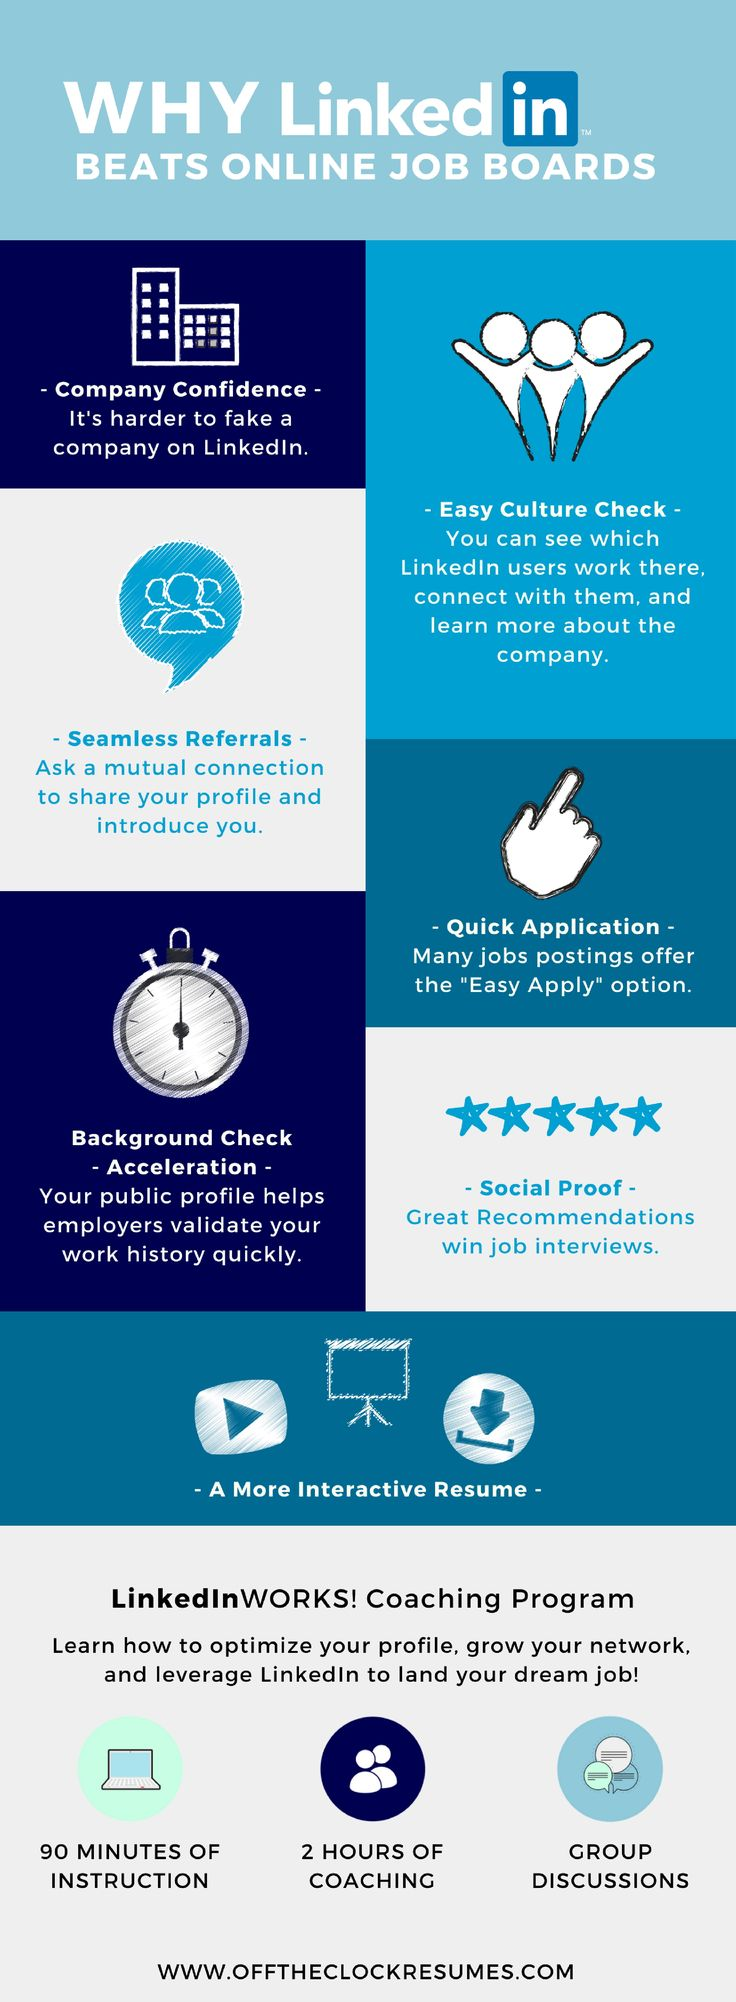 Why LinkedIn Beats Online Job Boards 123